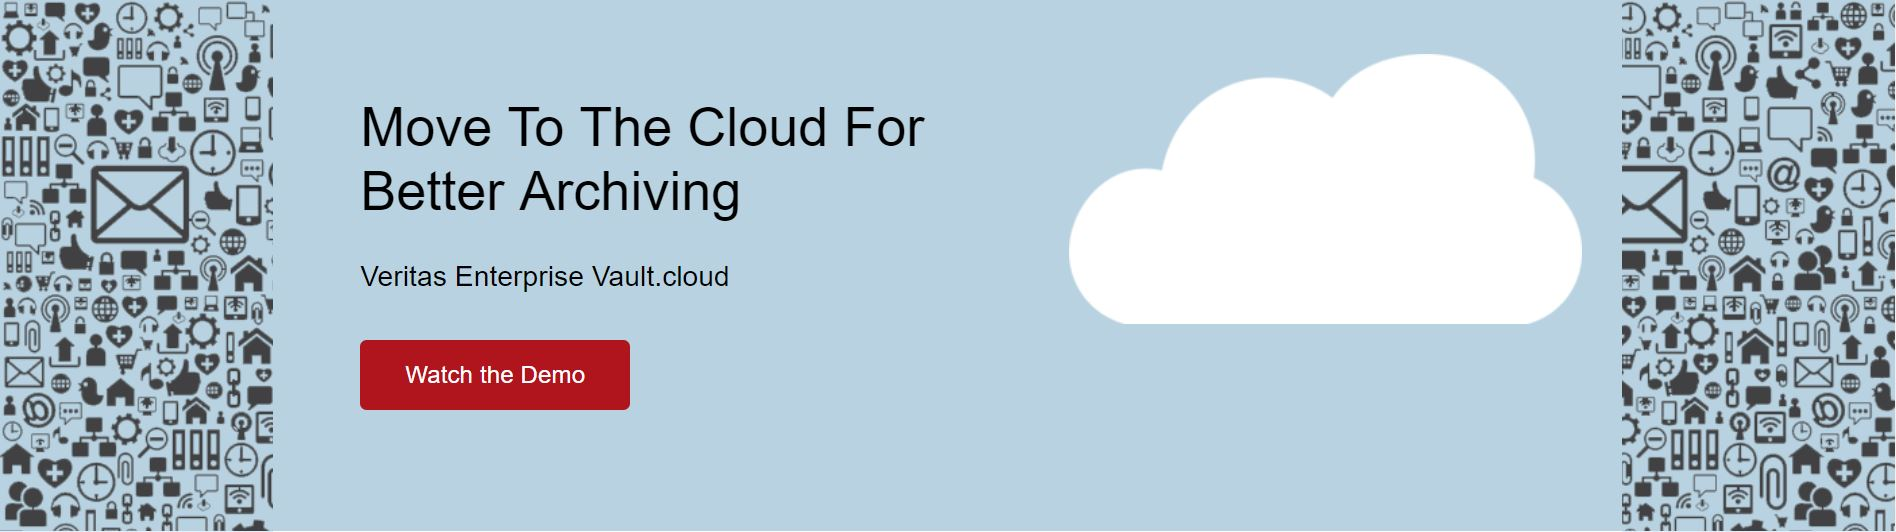 Veritas Enterprise Vault.cloud